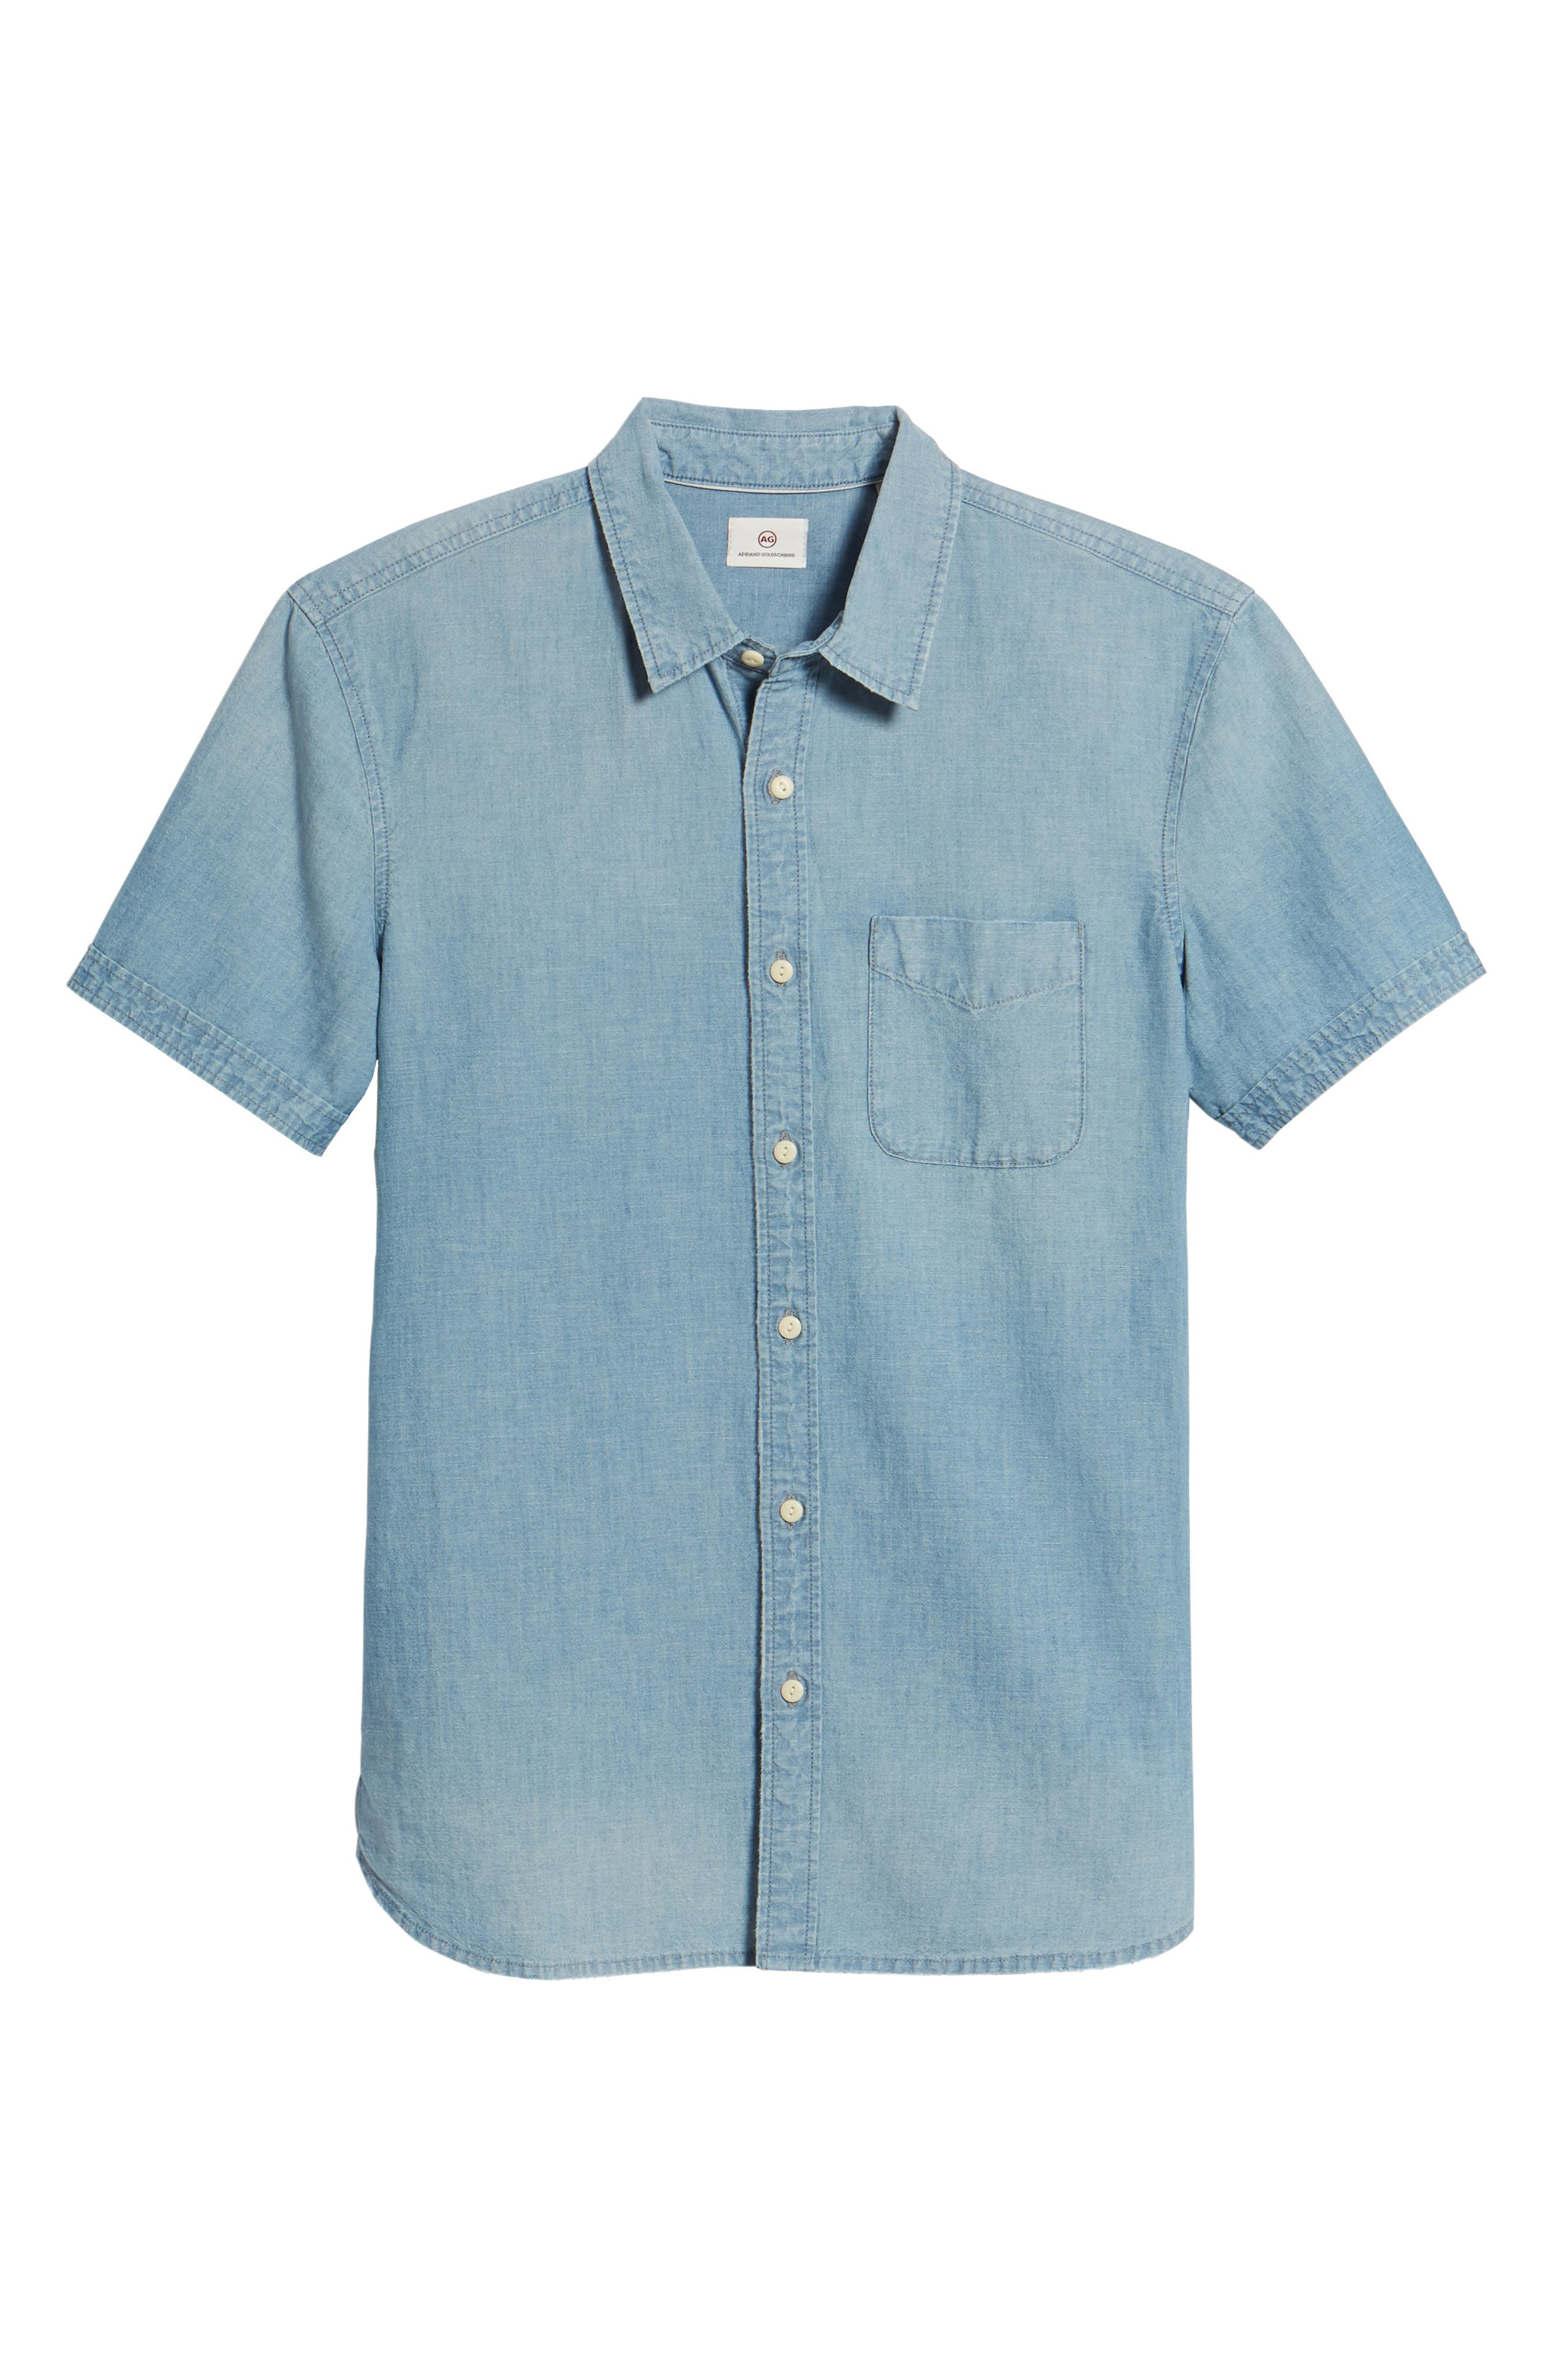 Pearson Regular Fit Short Sleeve Sport Shirt,                             Alternate thumbnail 6, color,                             400